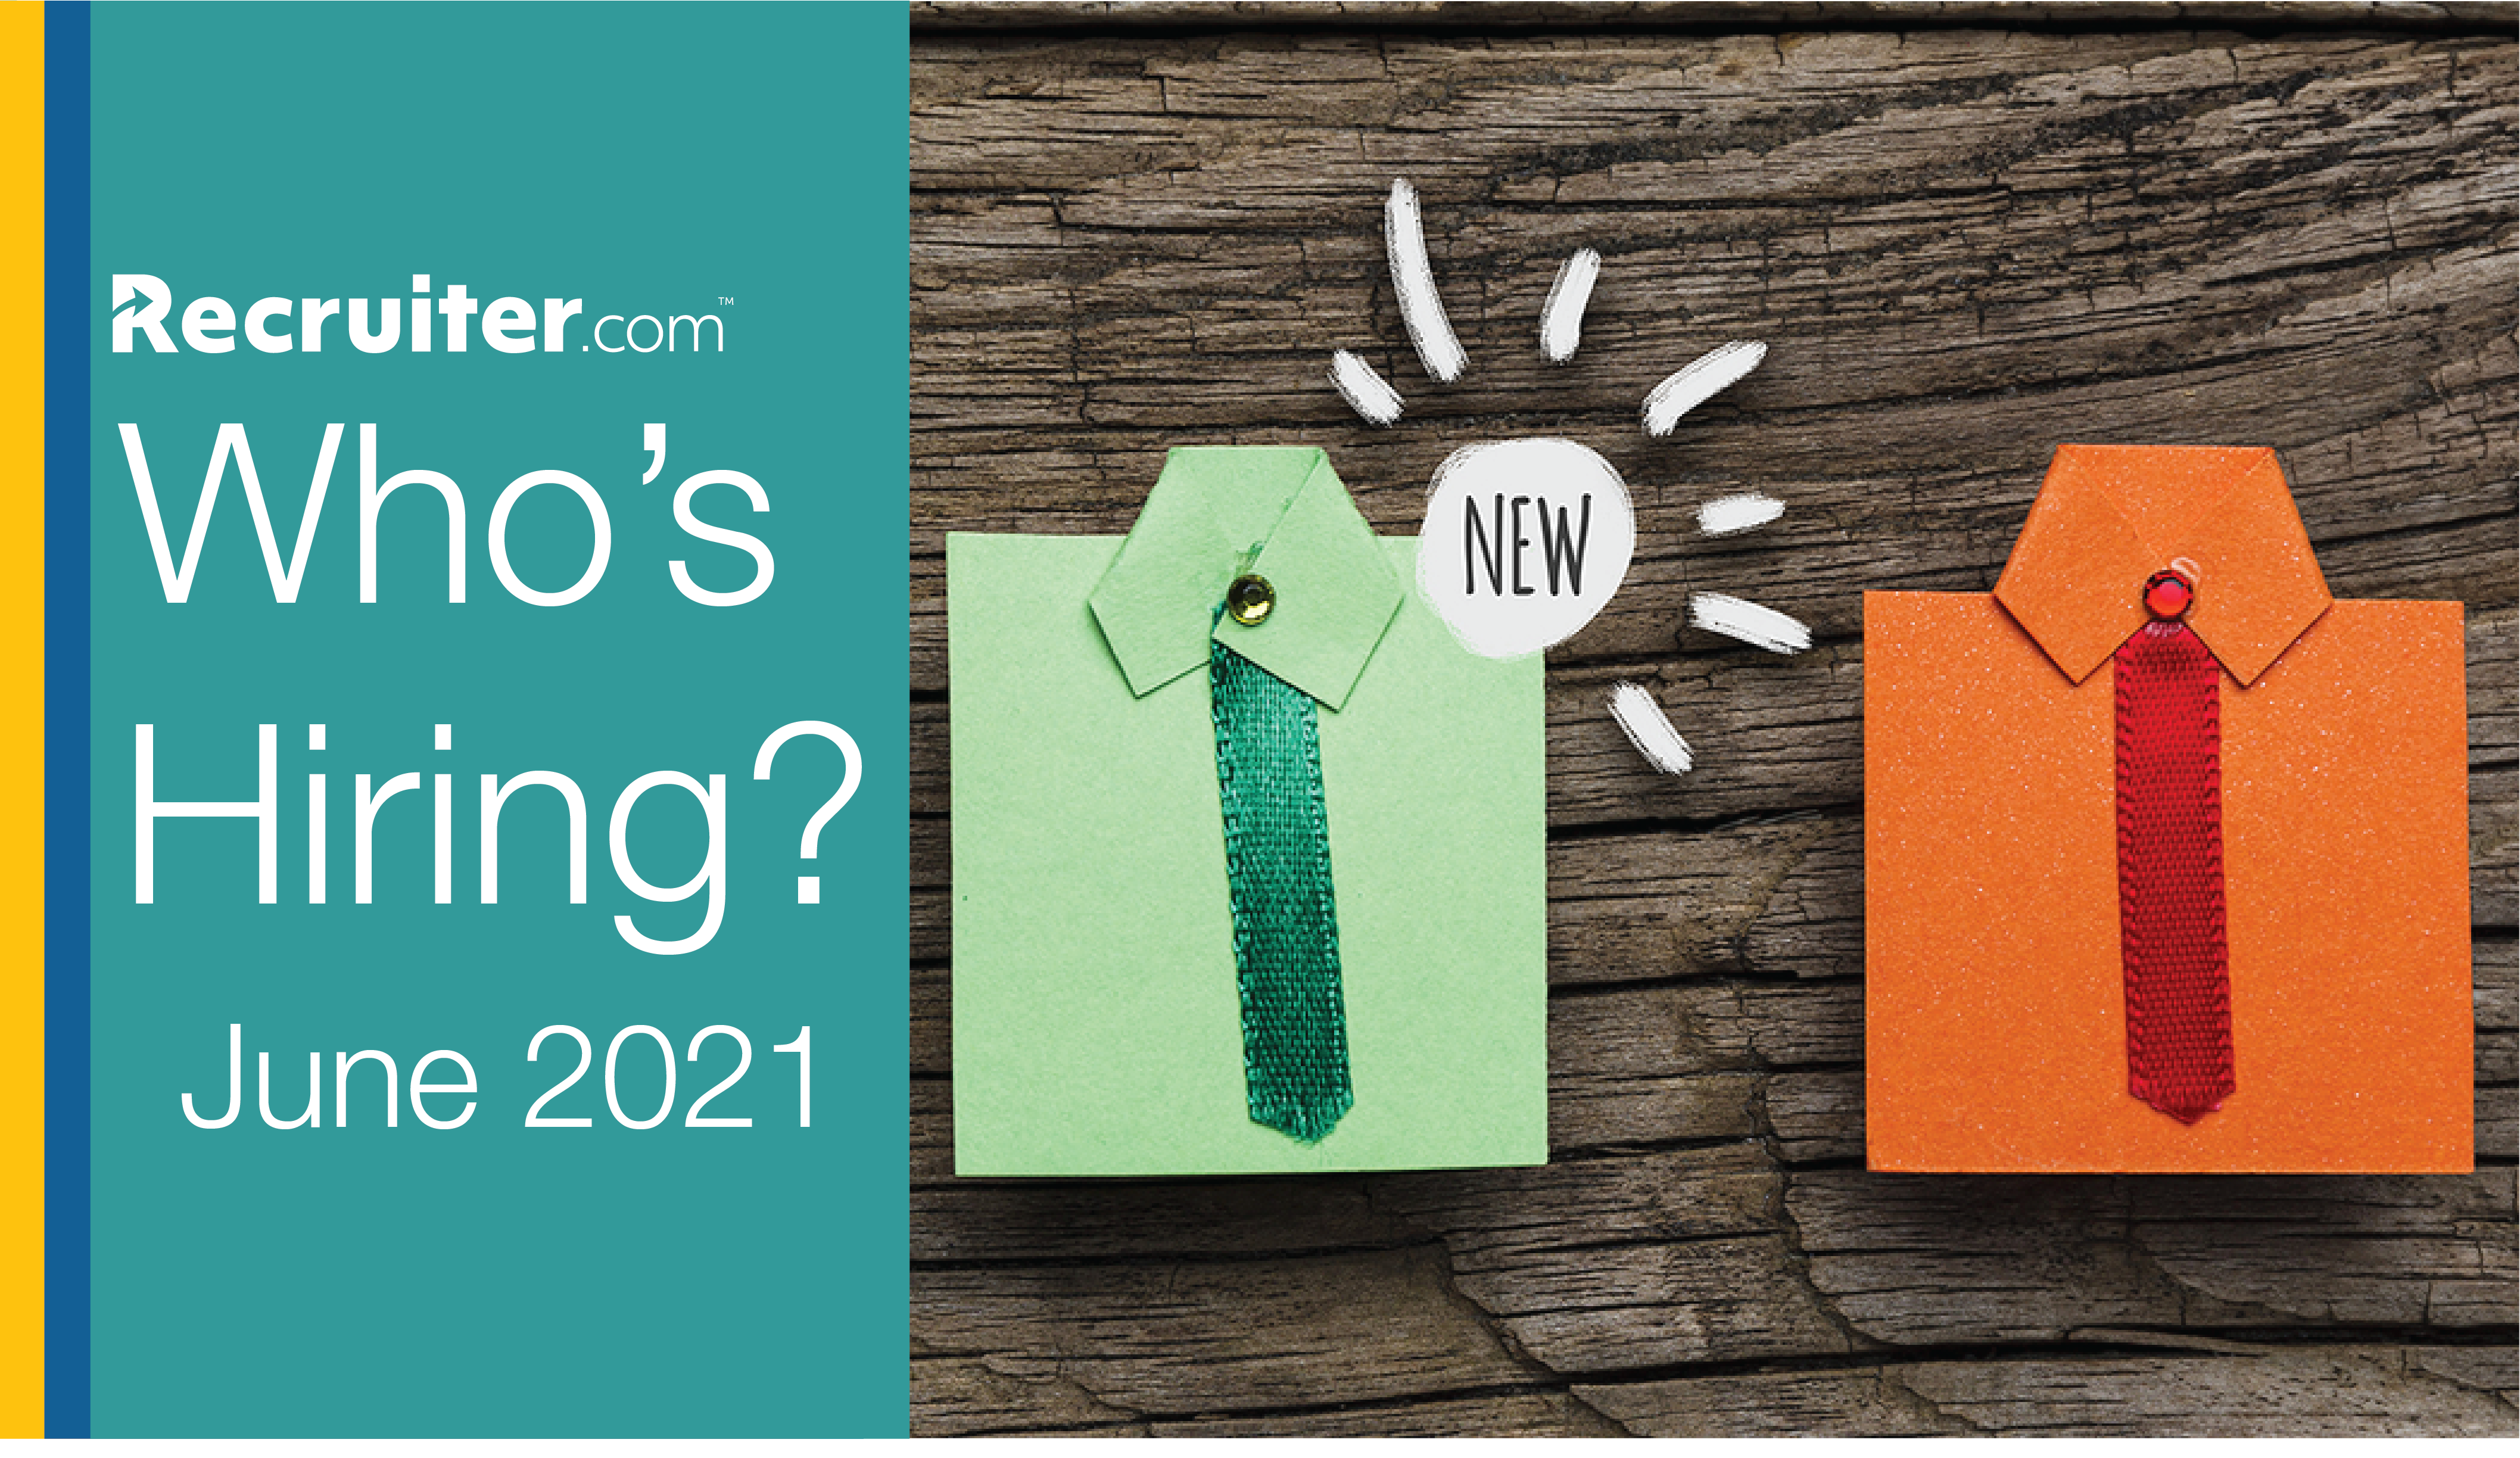 Companies Hiring June 2021